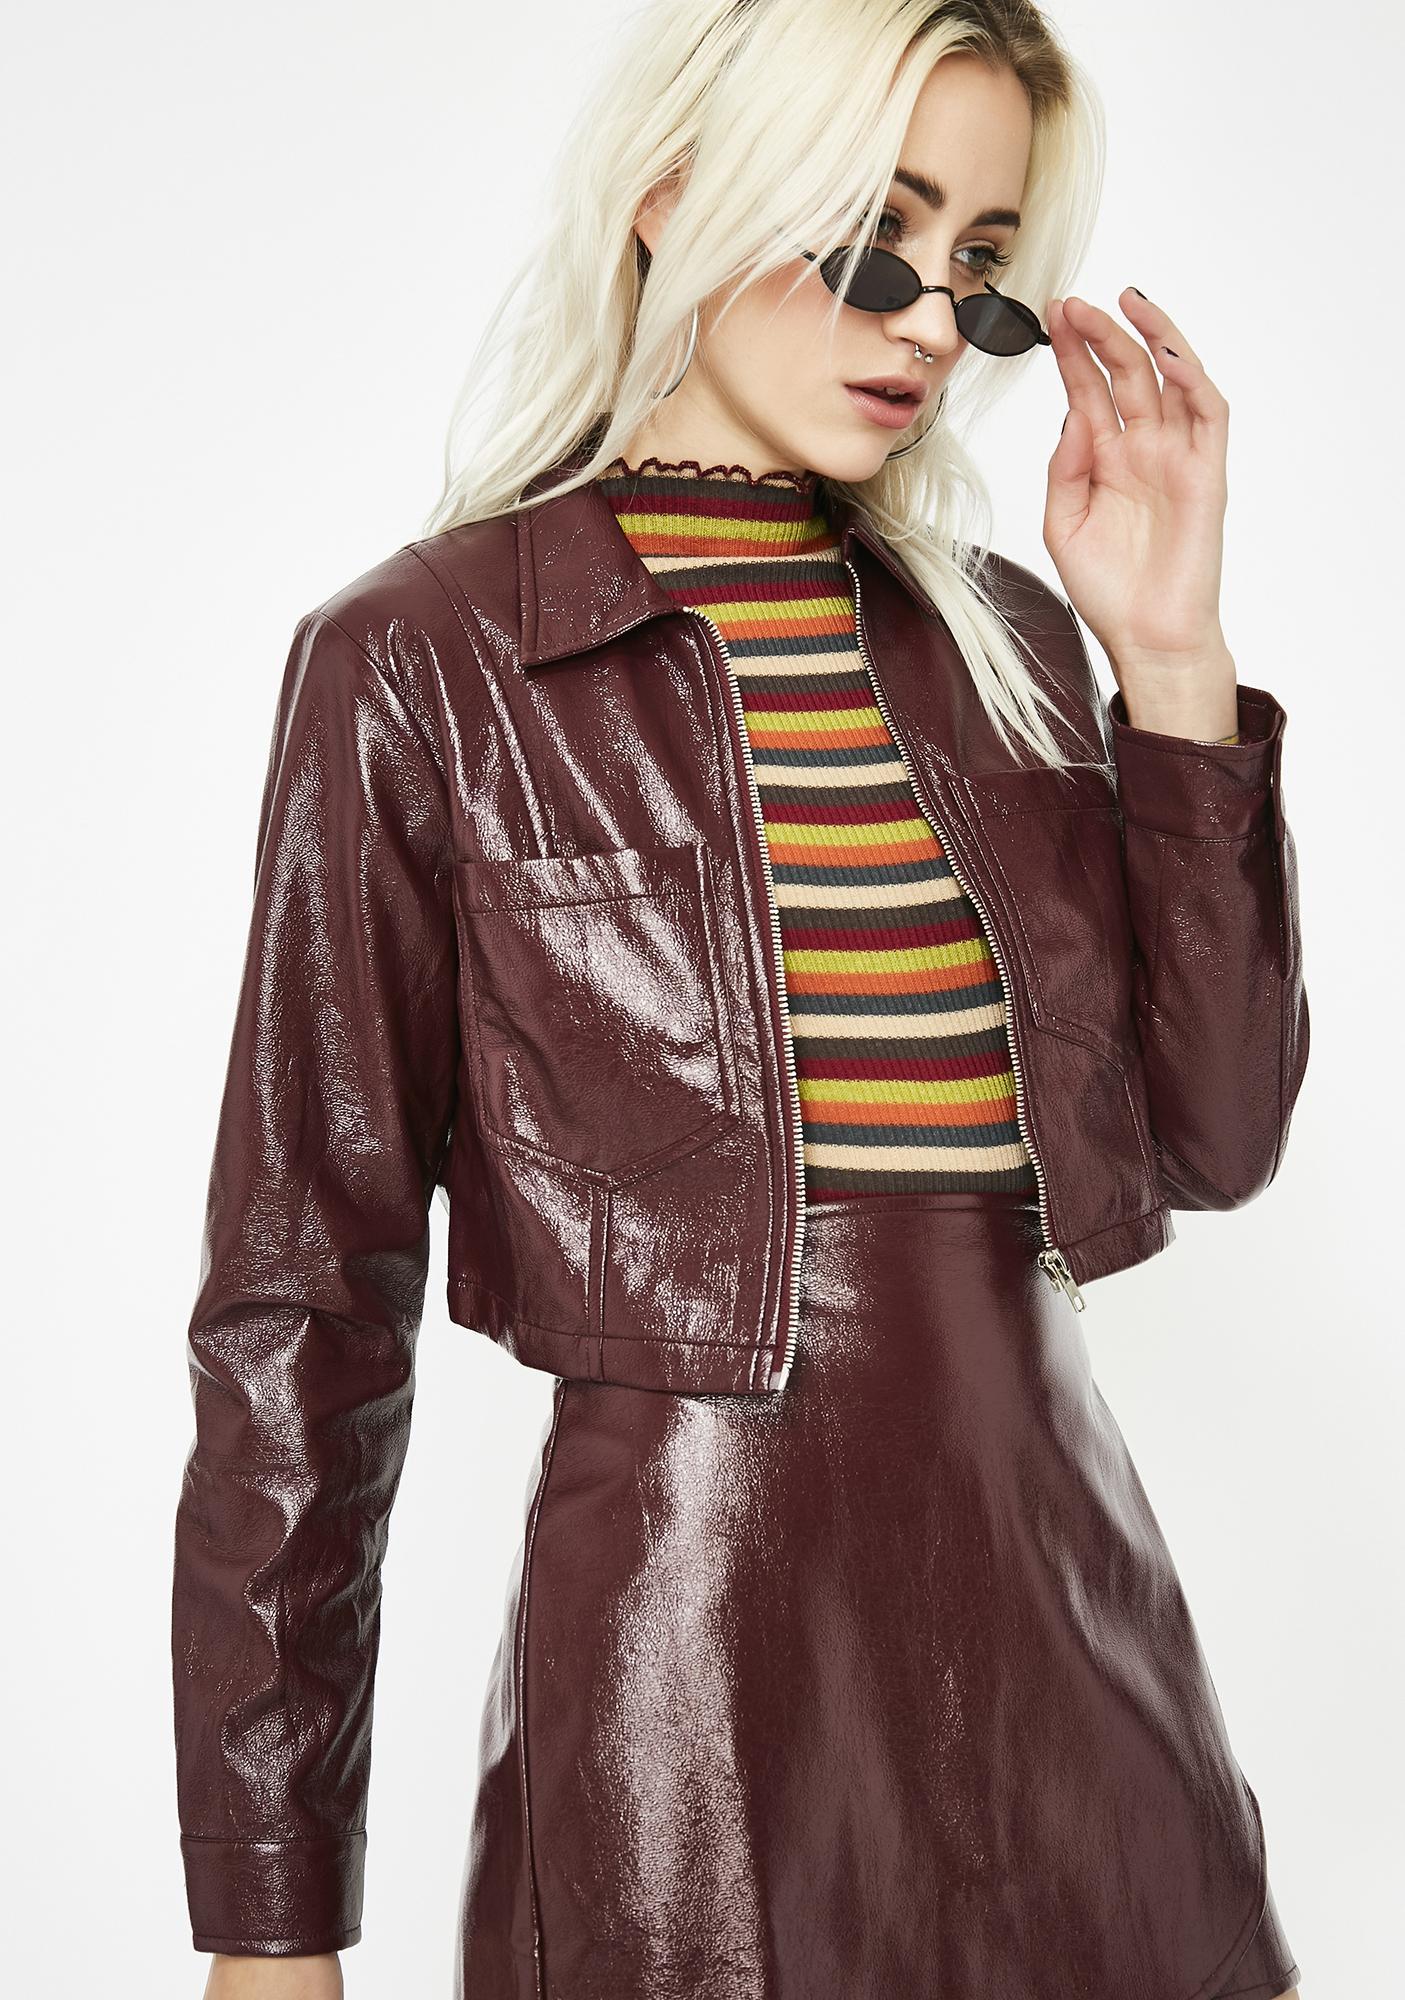 Baddie Company Vinyl Jacket